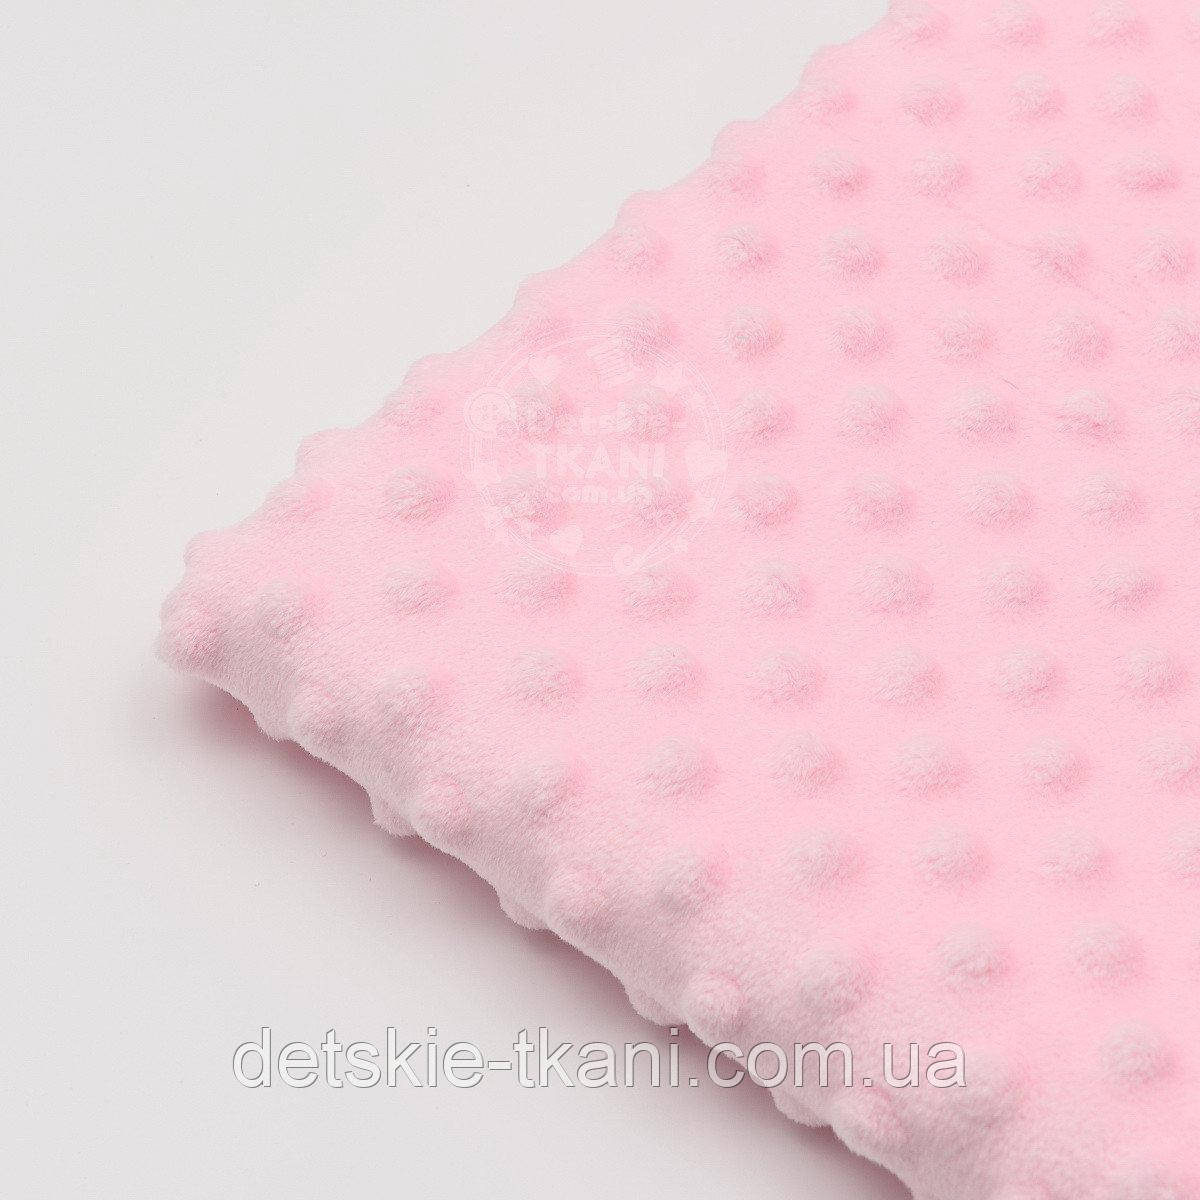 Лоскут плюша minky М-6 цвет светло розовый, размер 40*160 см